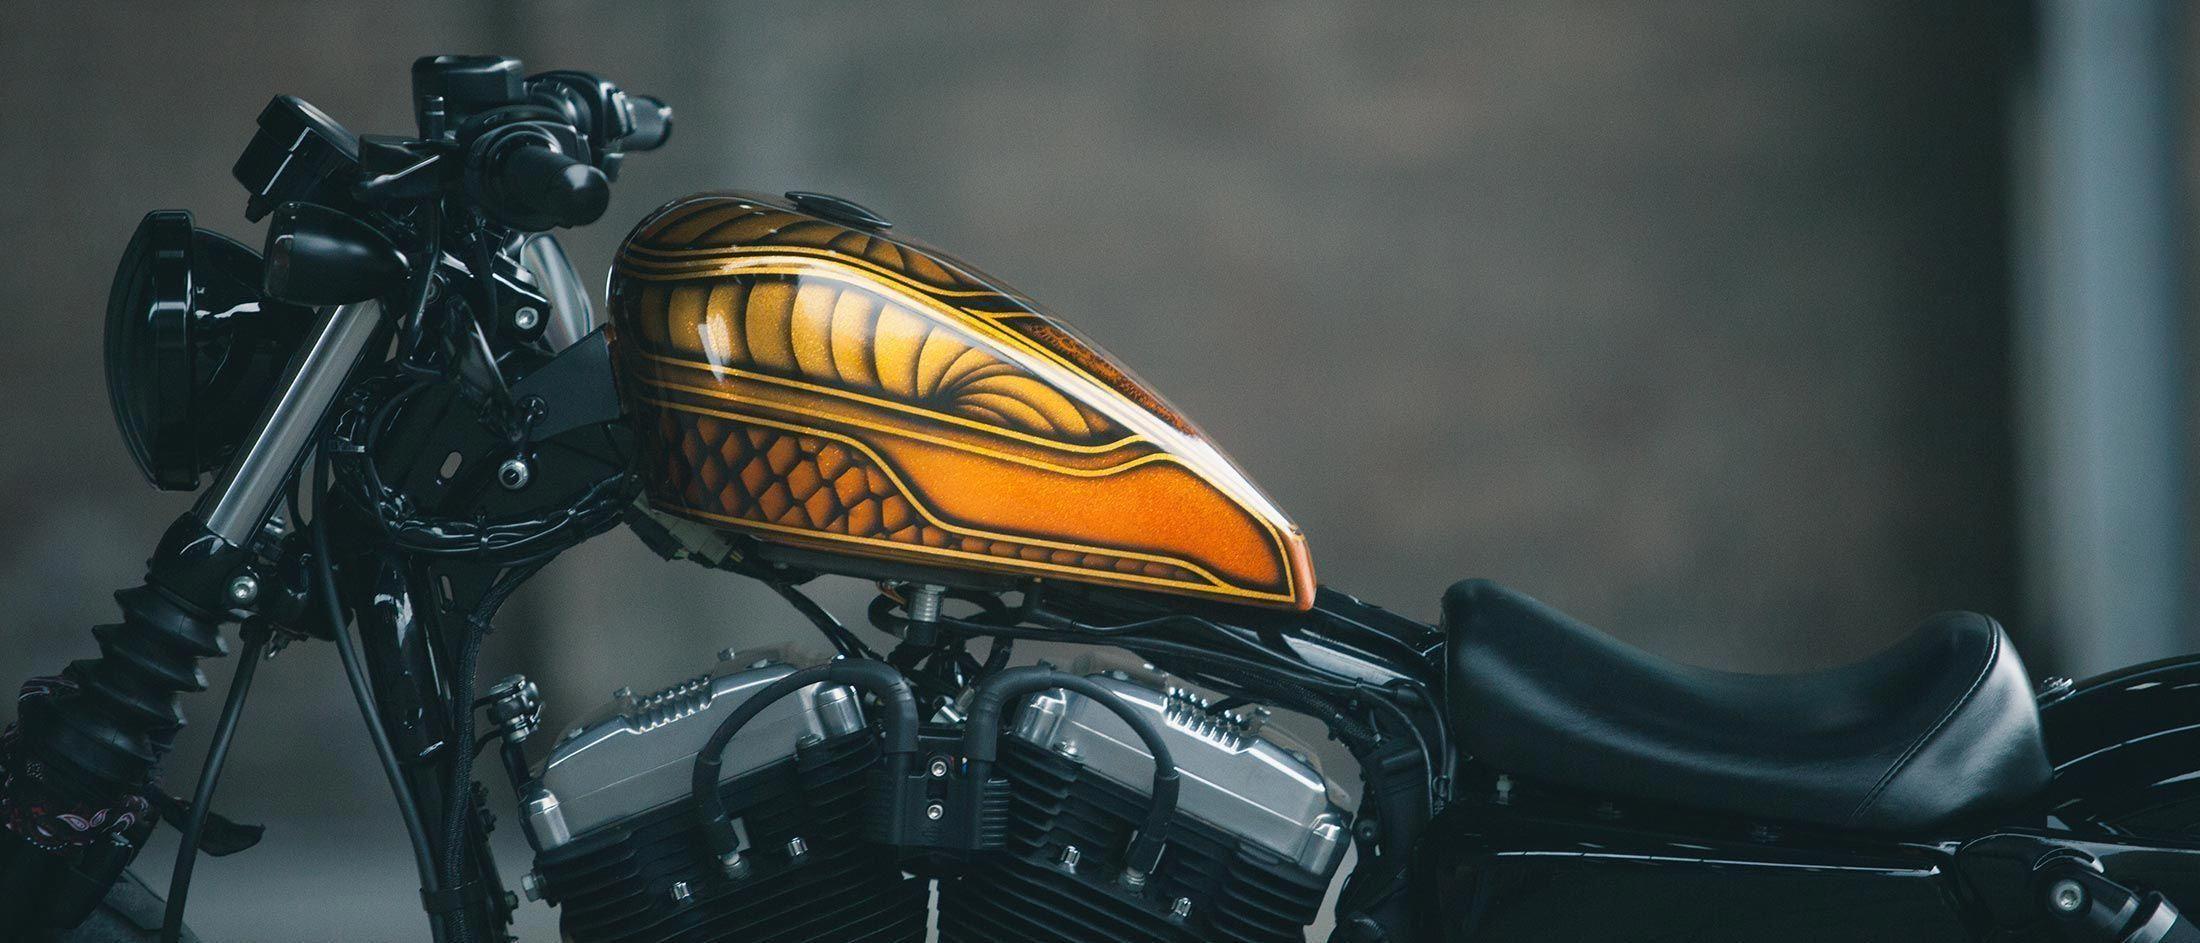 Ninetynineco Ninety Nine Co Harley Davidson Harley Davidson Forty Eight Sportster 48 Fortyeight Iron 883 Chris Harley Davidson Bikes Harley Harley Davidson